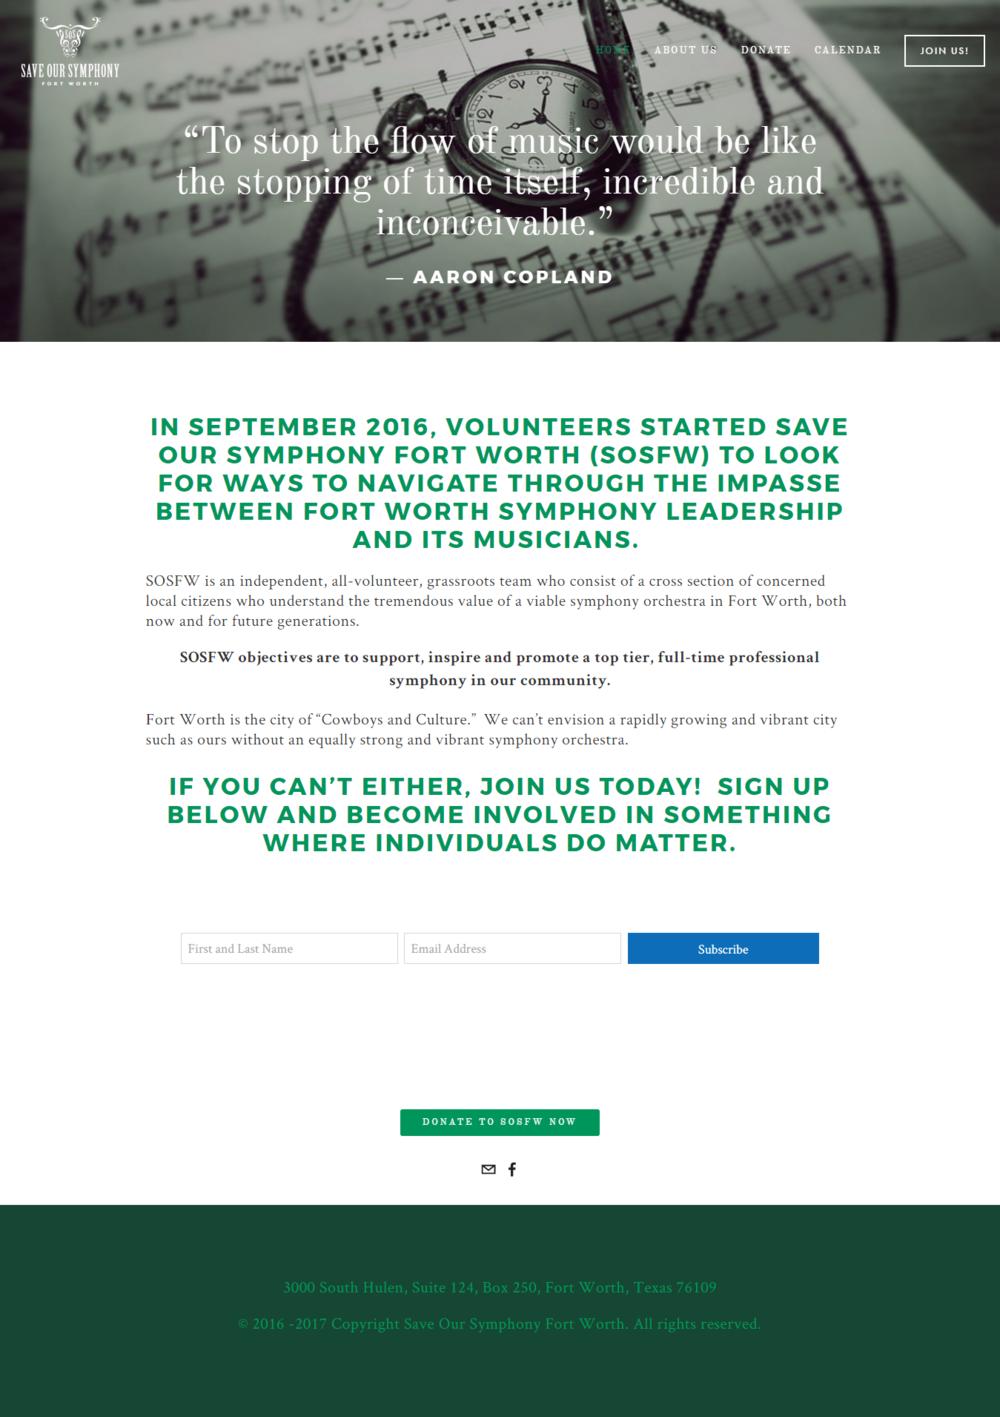 screenshot-www.sosfw.org 2017-02-24 15-14-53.png